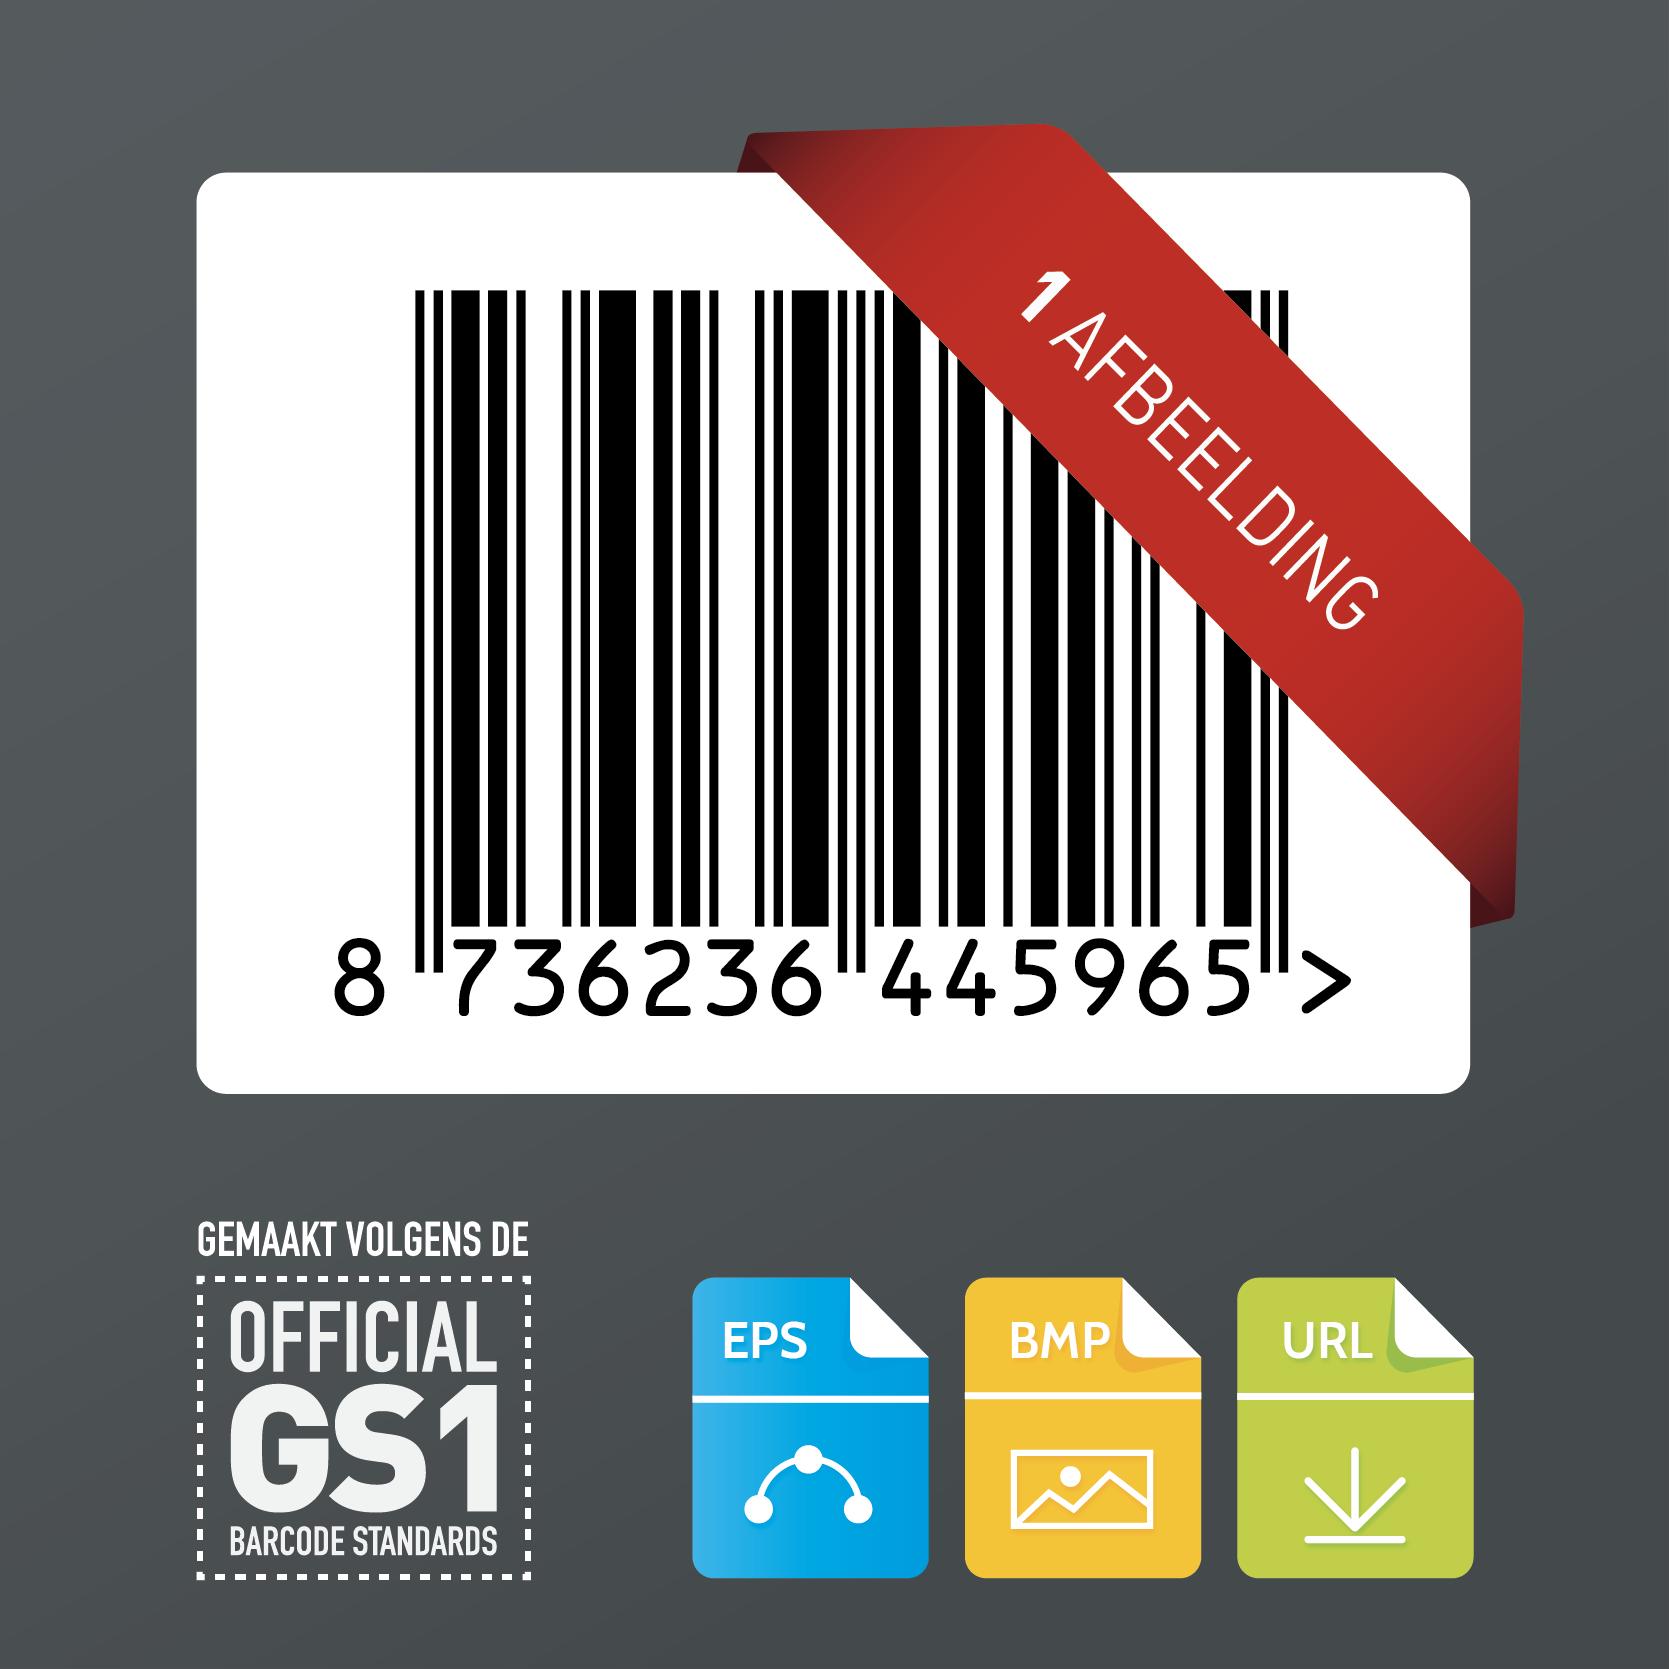 1x GS1 barcode afbeelding